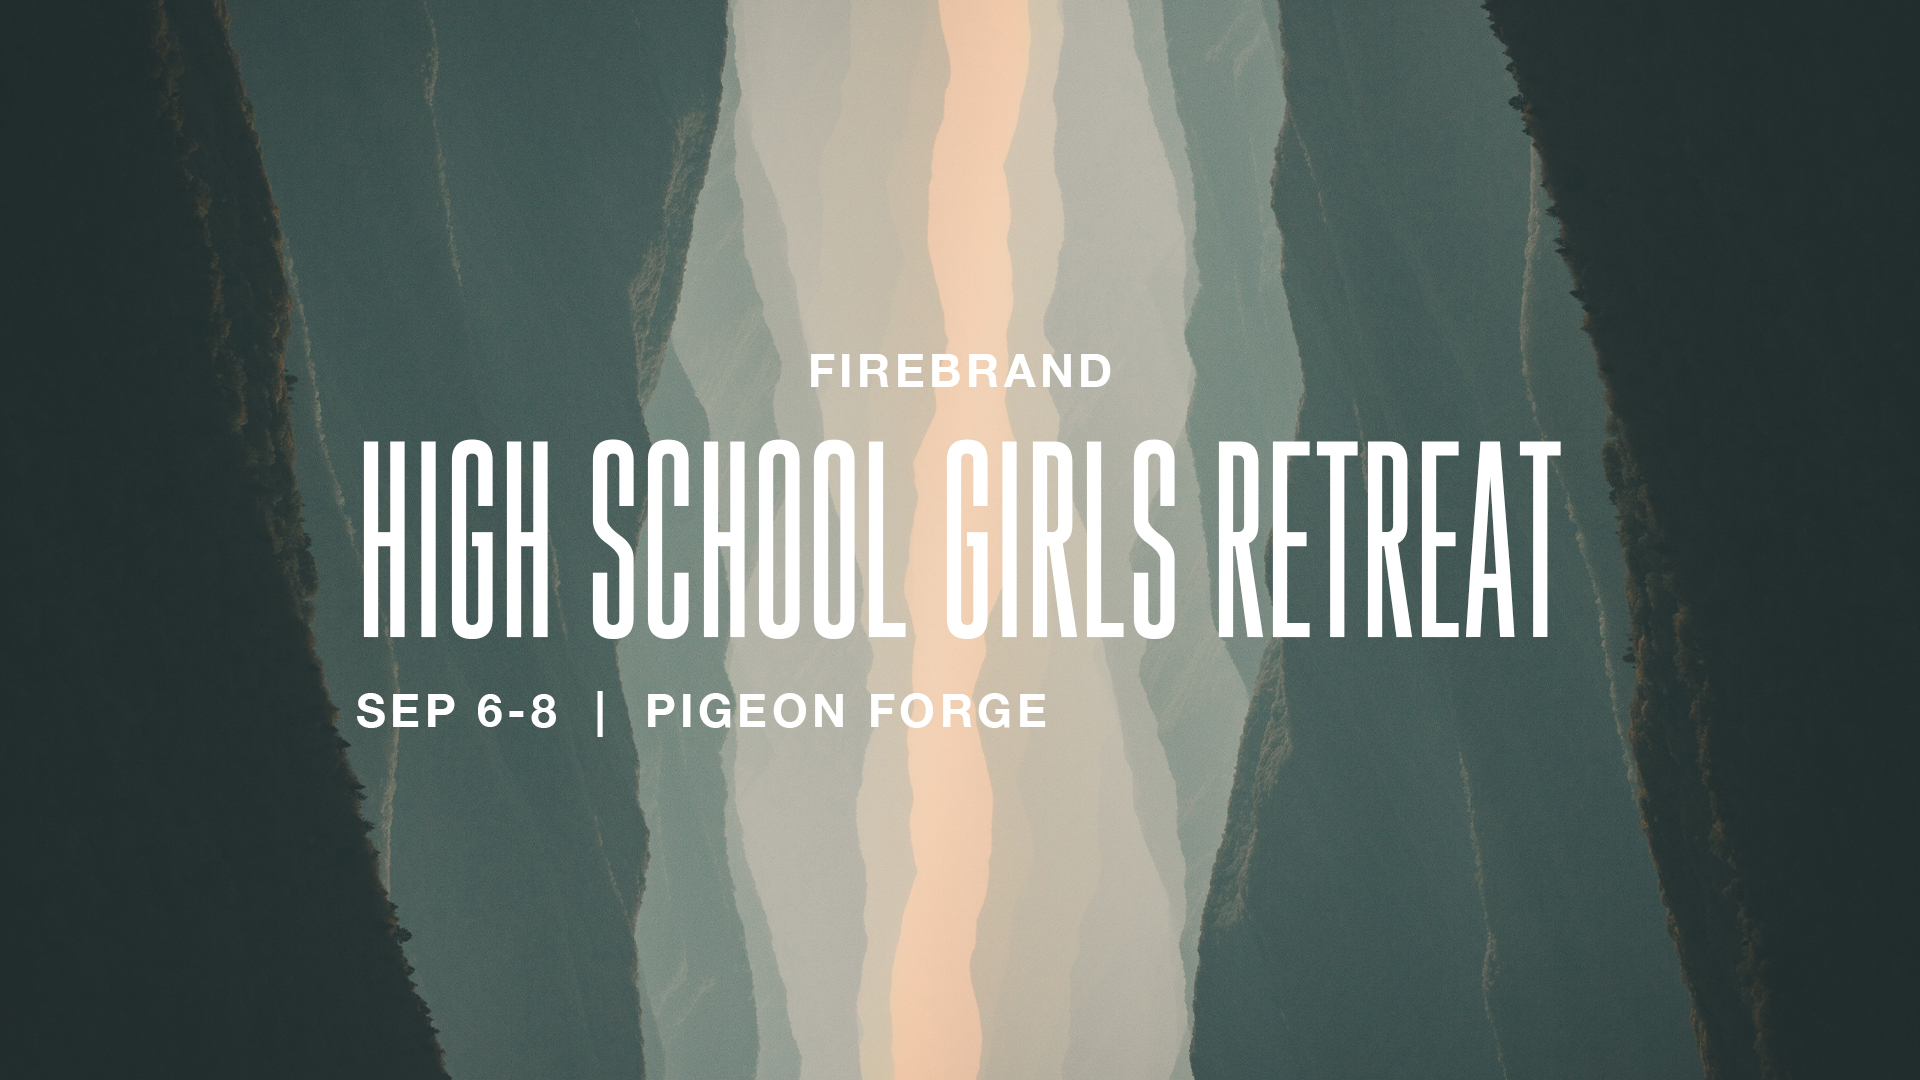 FirebrandHighSchoolGirlsRetreat